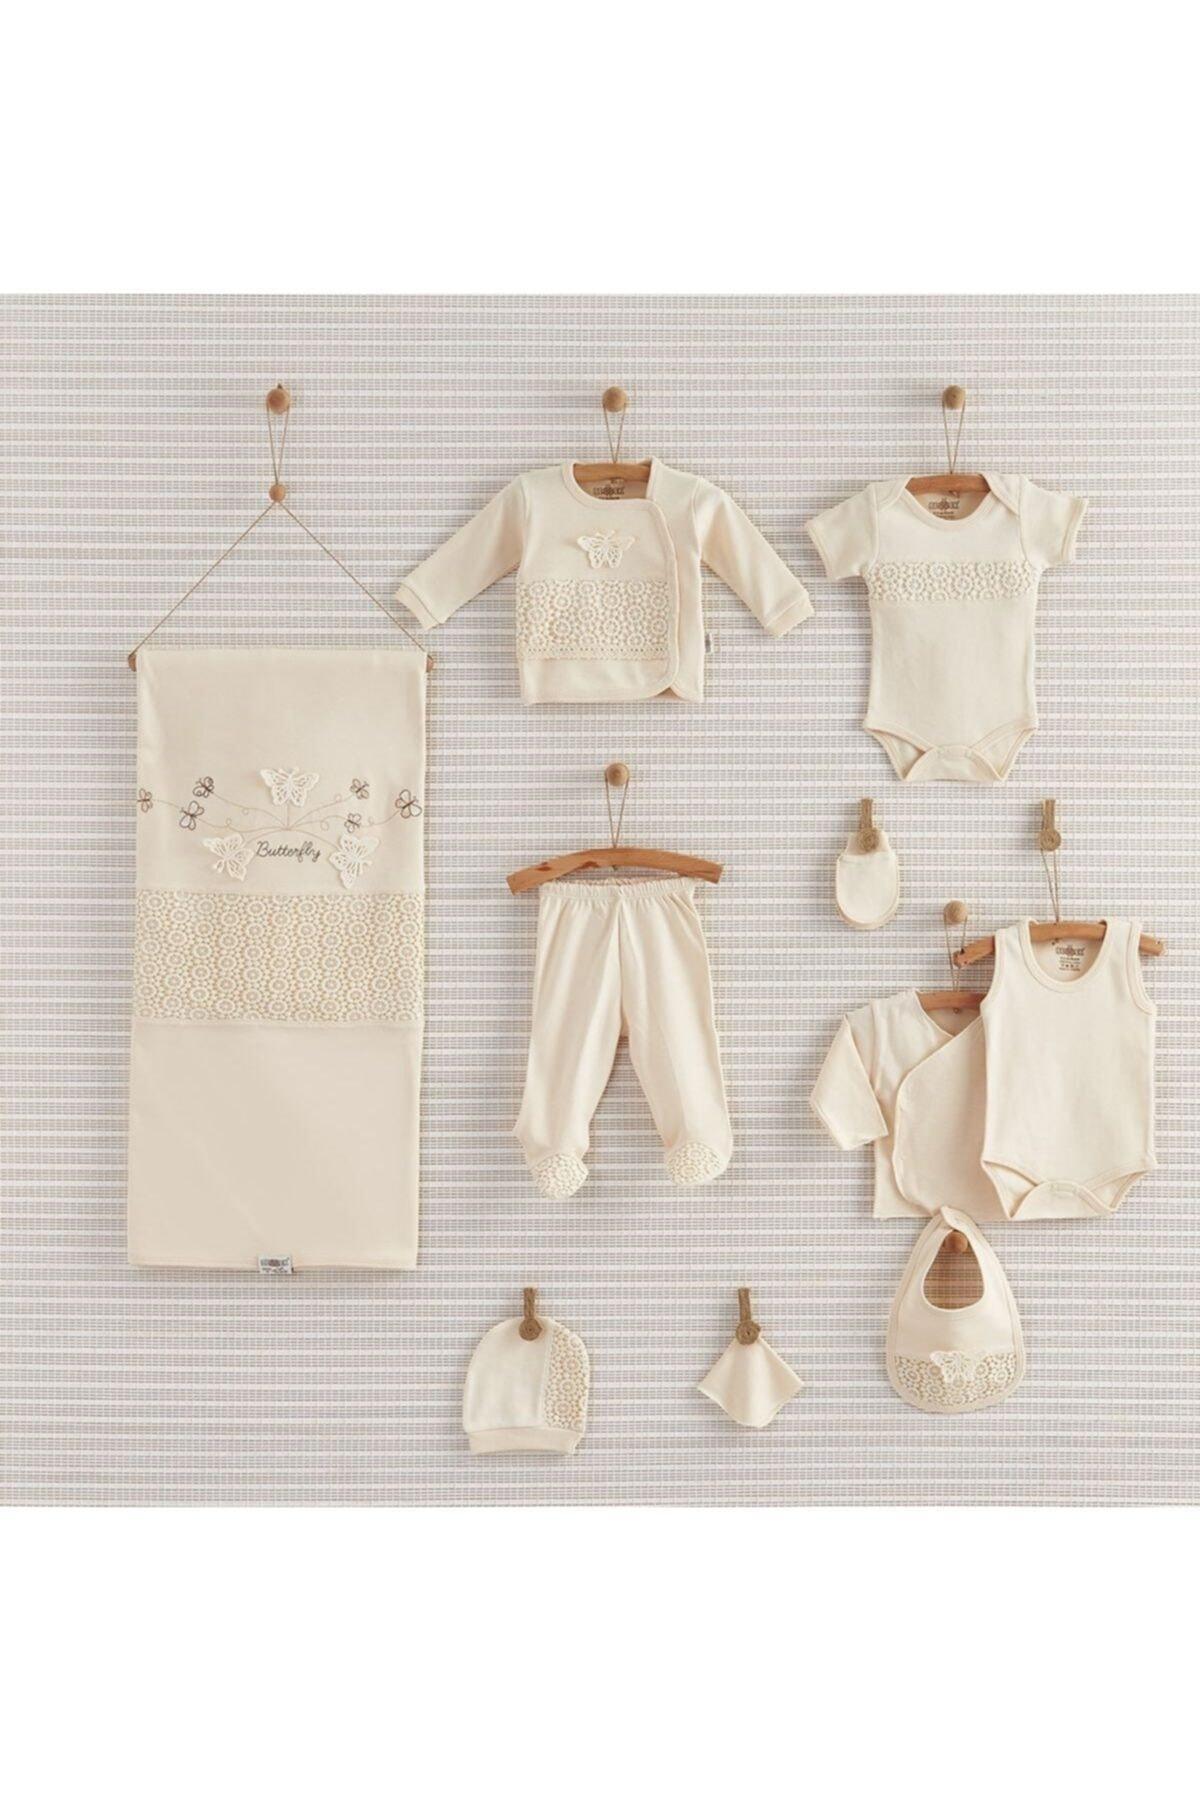 Bebbek Kız Bebek Ekru Butterfly Organik 10'lu Hastane Çıkışı 19-052 1